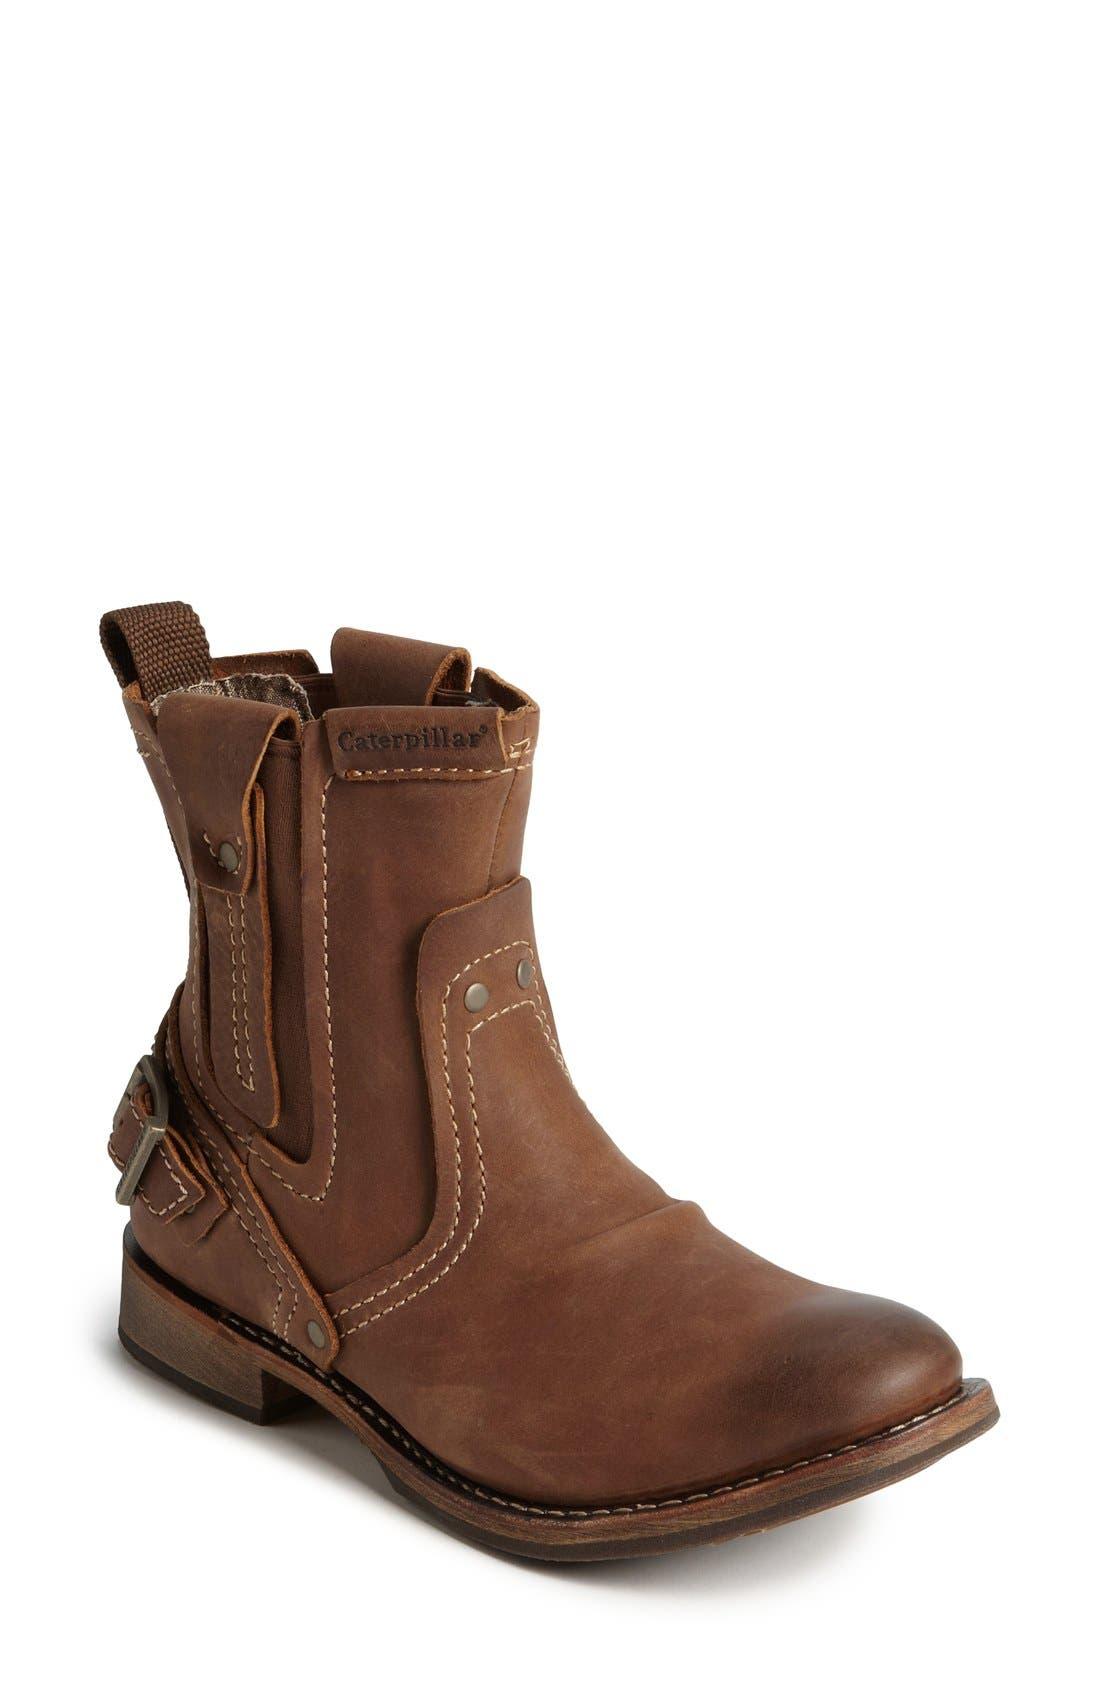 Main Image - Caterpillar 'Vinson' Boot (Men)